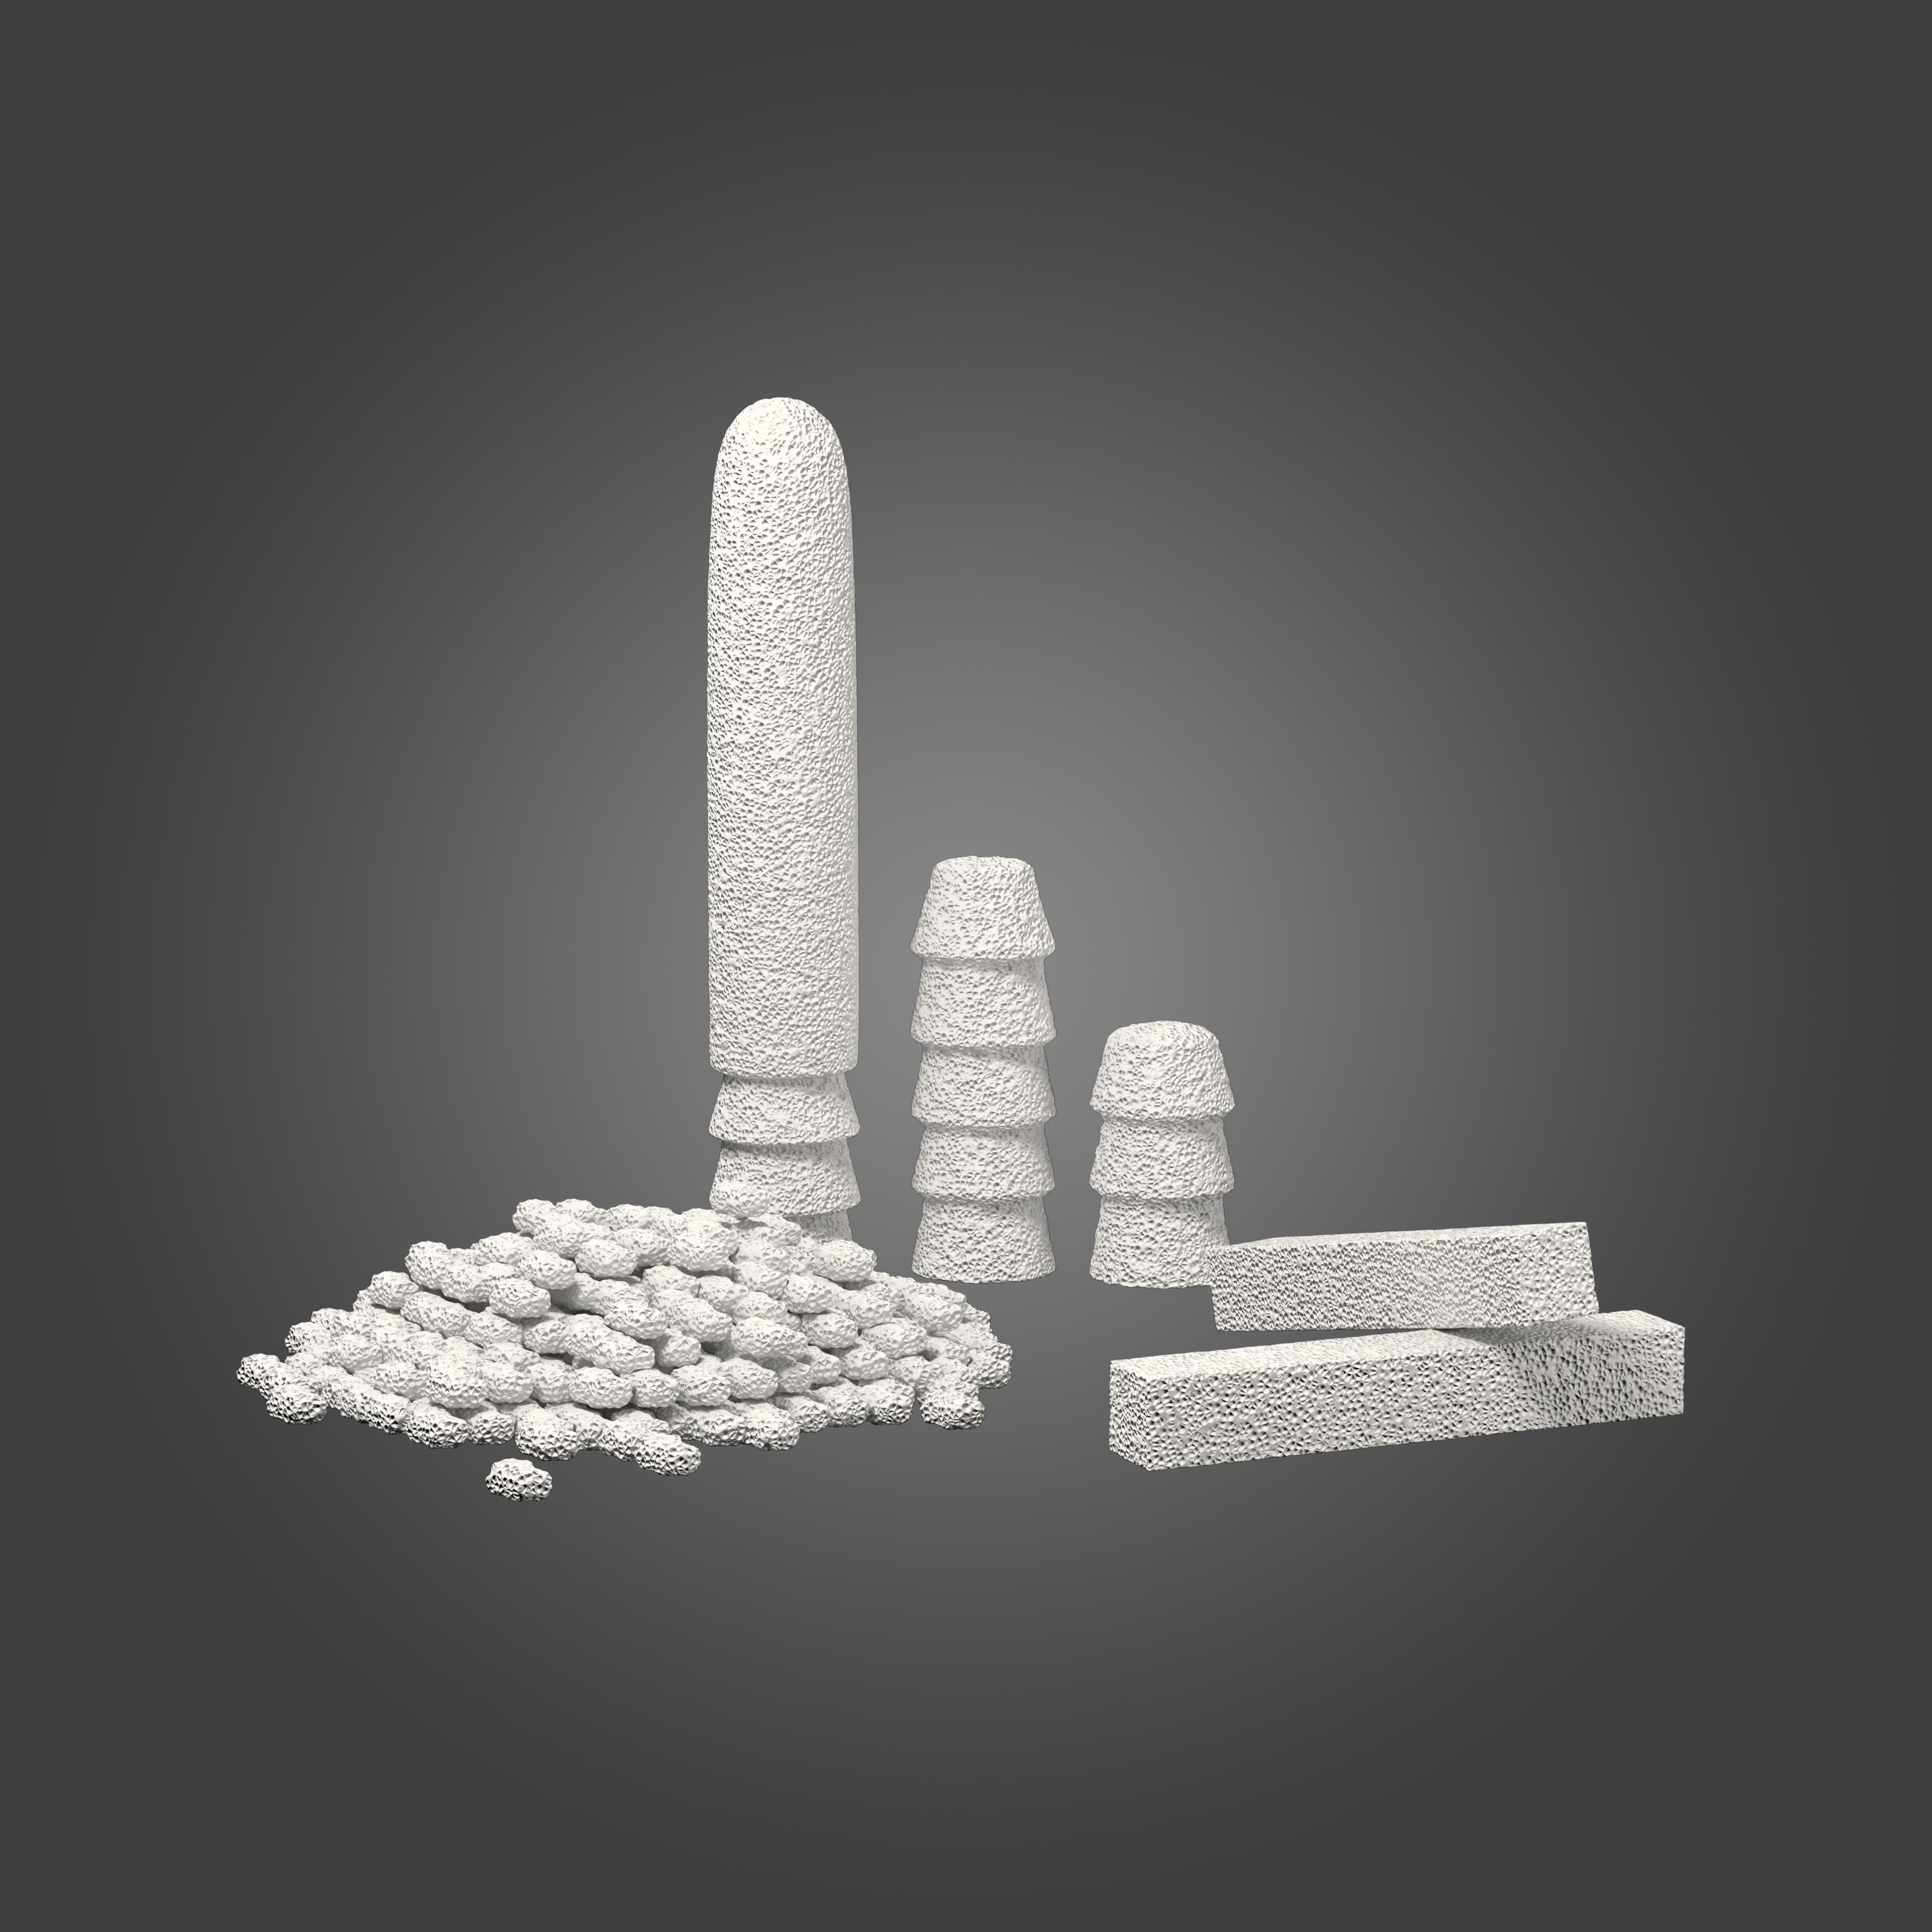 ArtificalBone多孔生物陶瓷人工骨